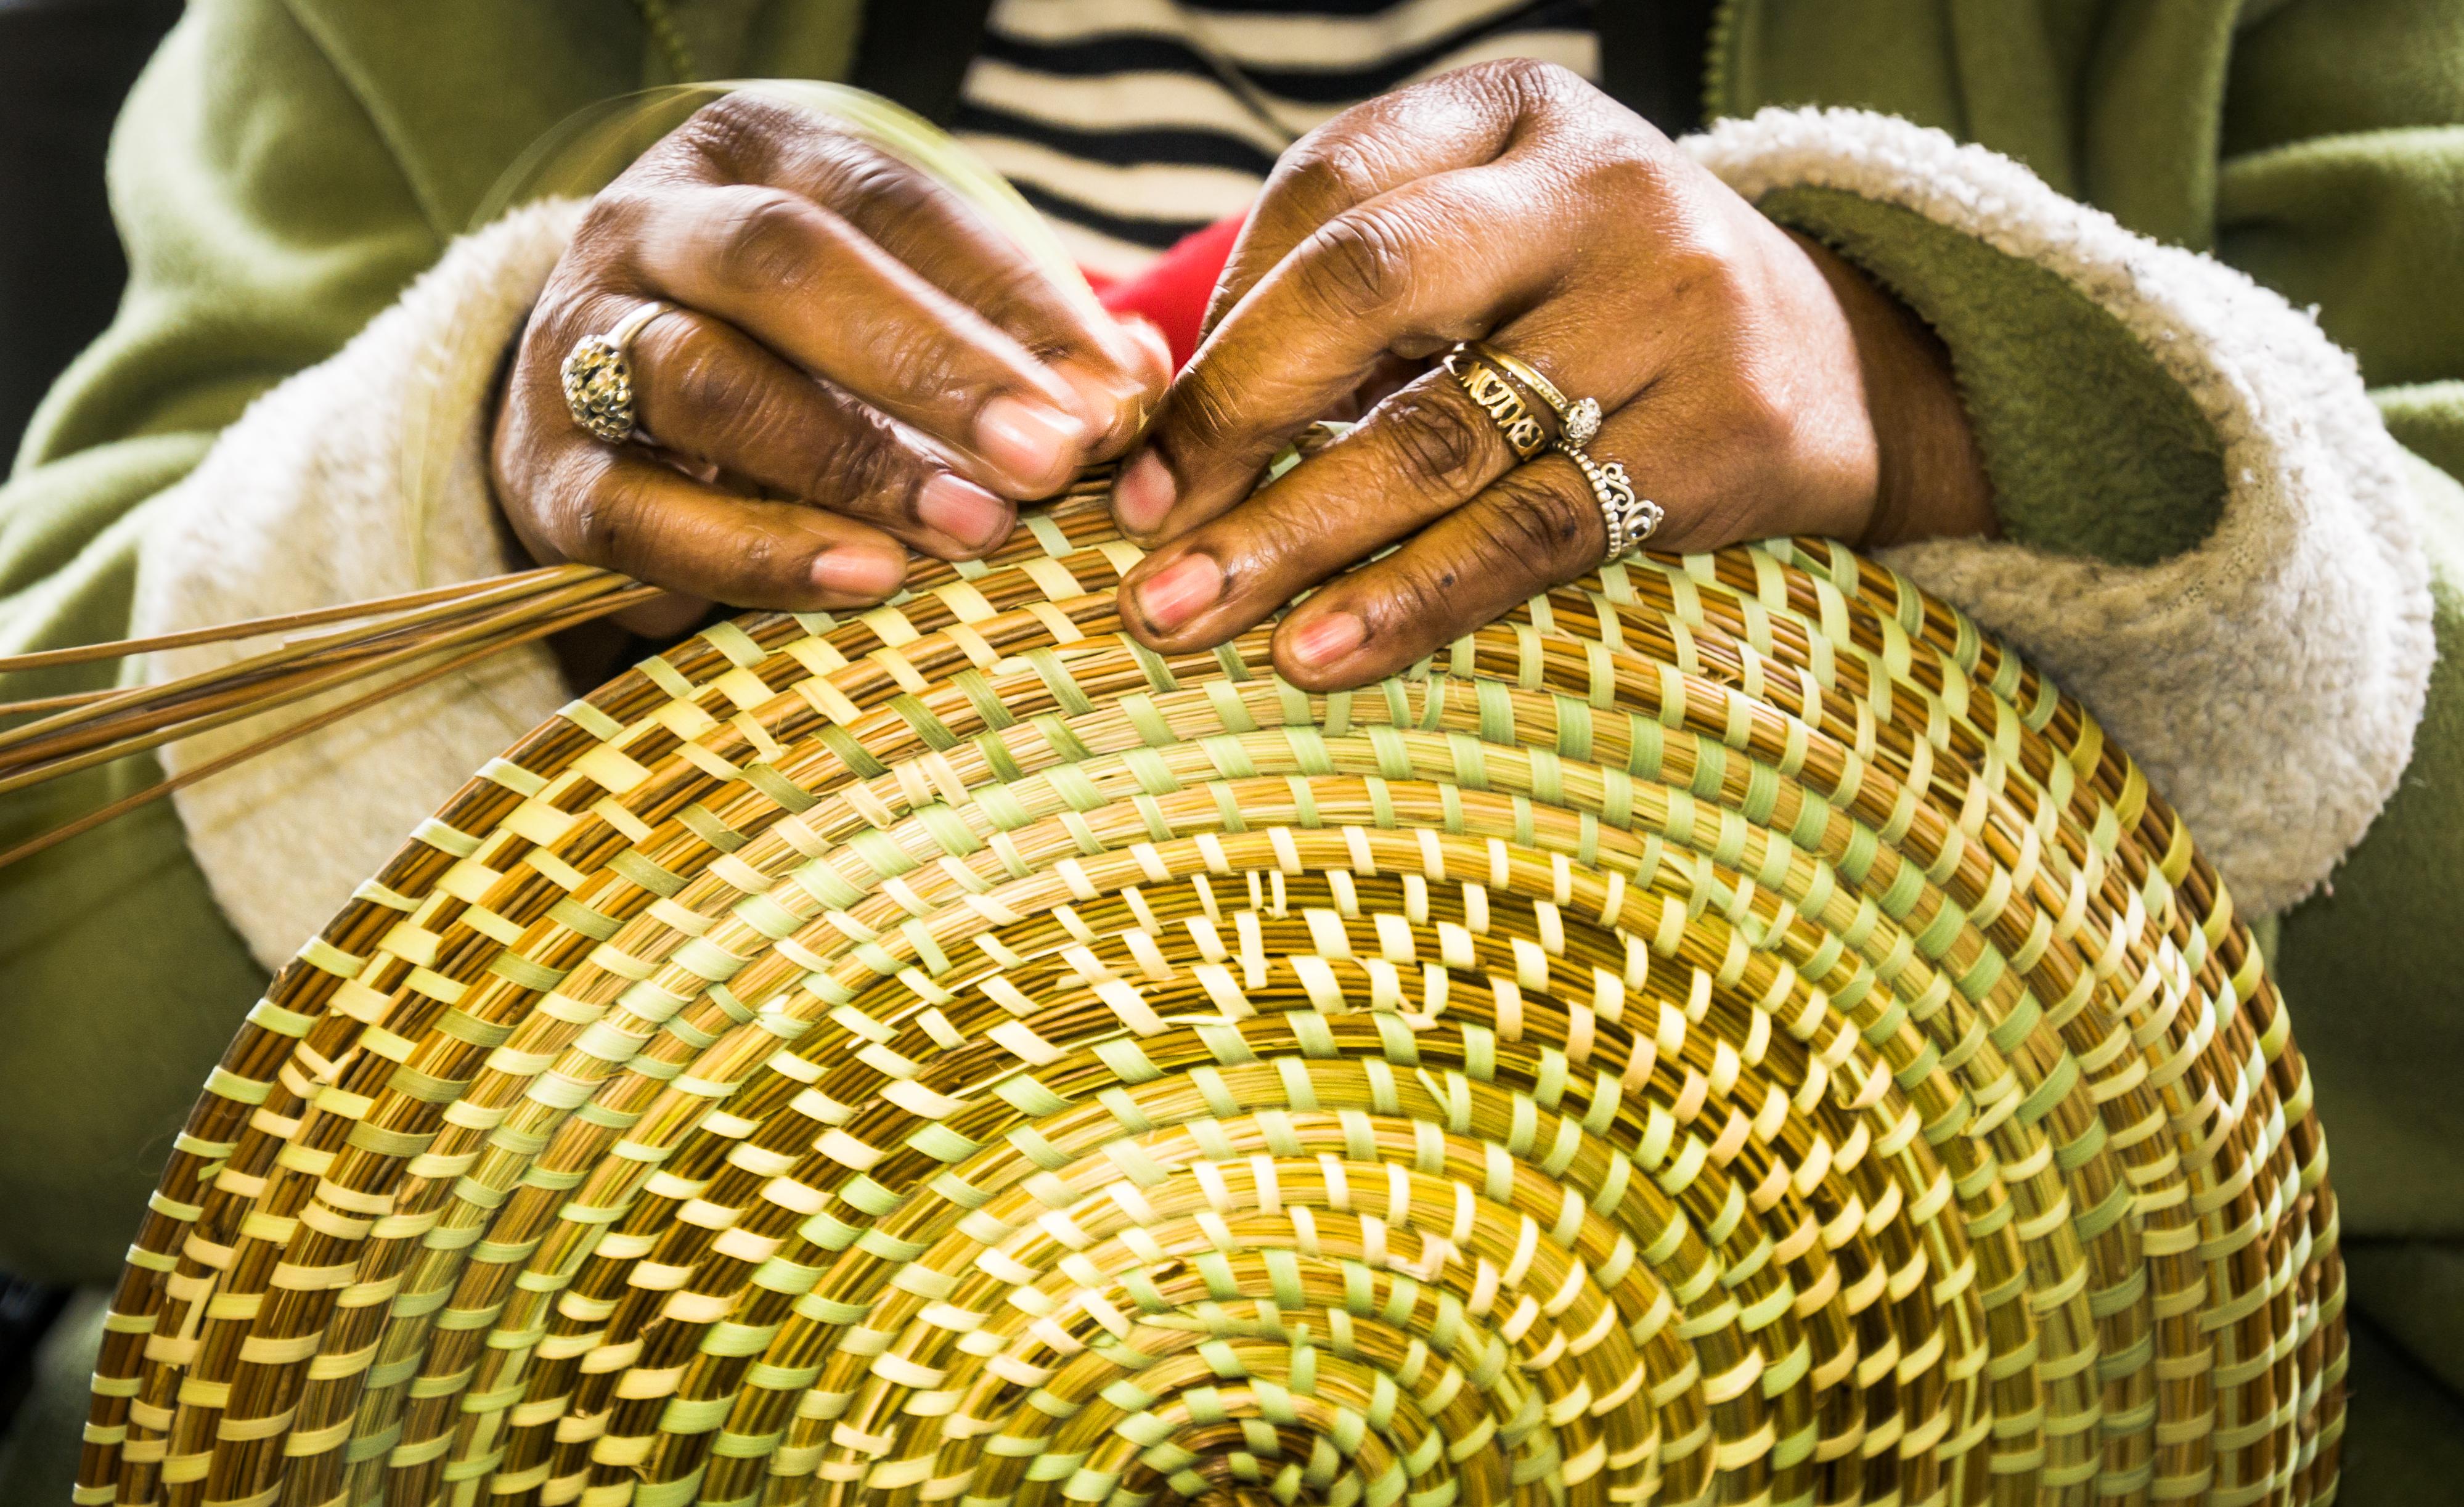 Sweetgrass basket woven in Charleston, South Carolina